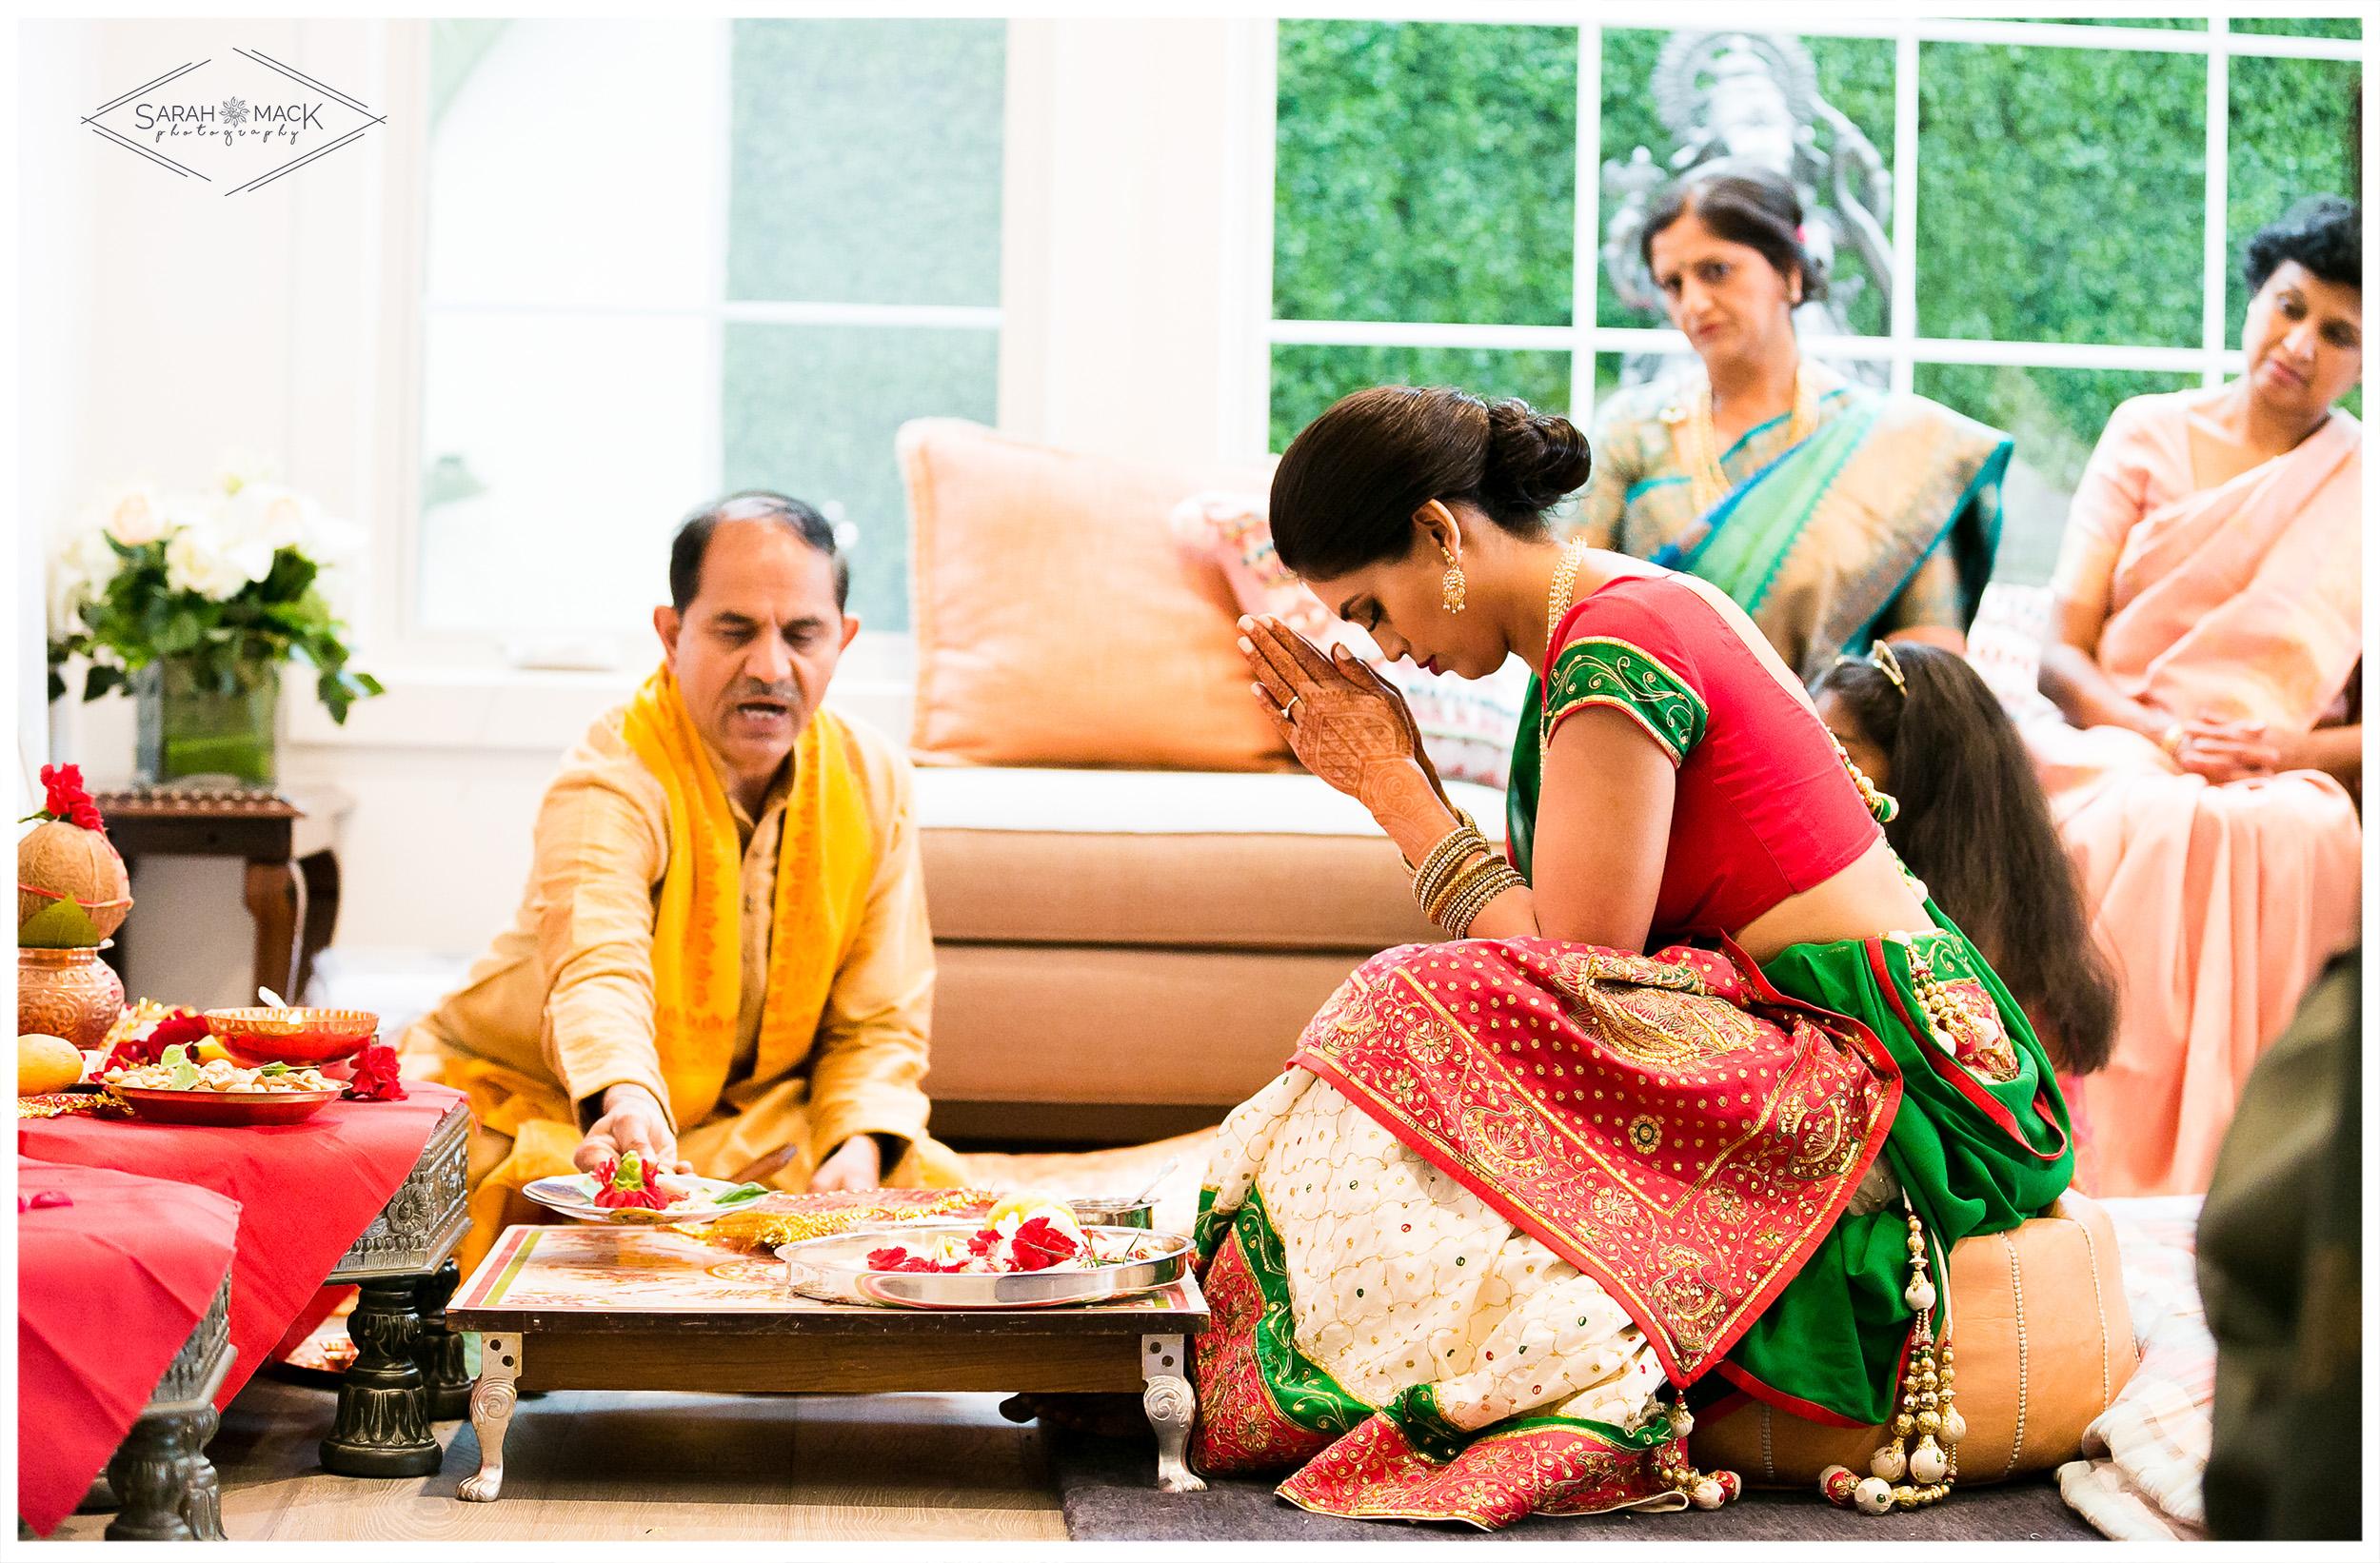 PR-Irvine-Ganesh-Pooja-Indian-Wedding-Photography-6.jpg